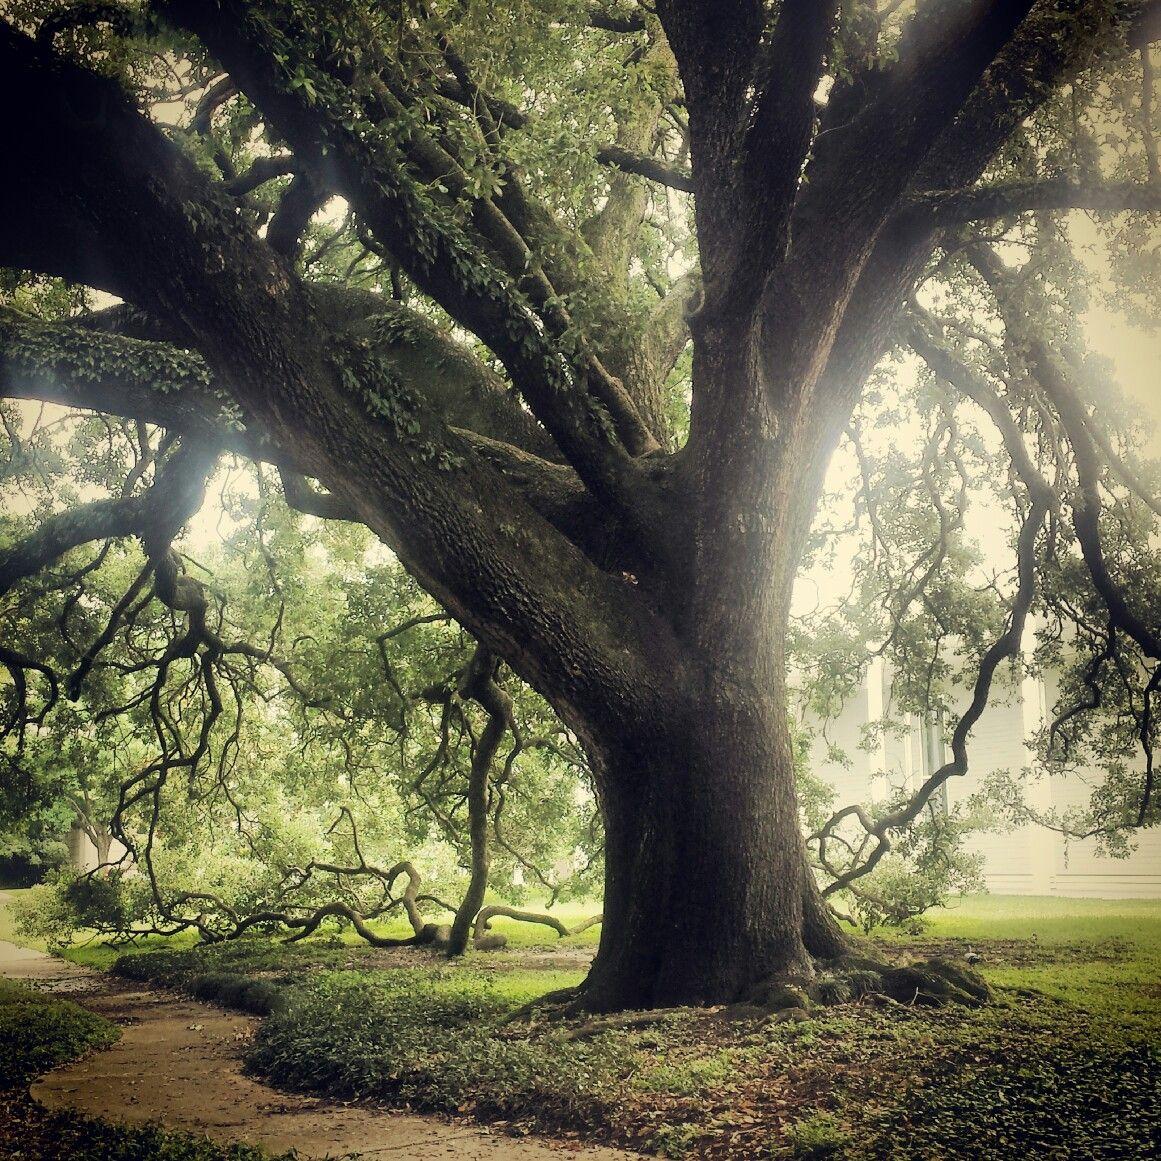 Giant Royal Oak